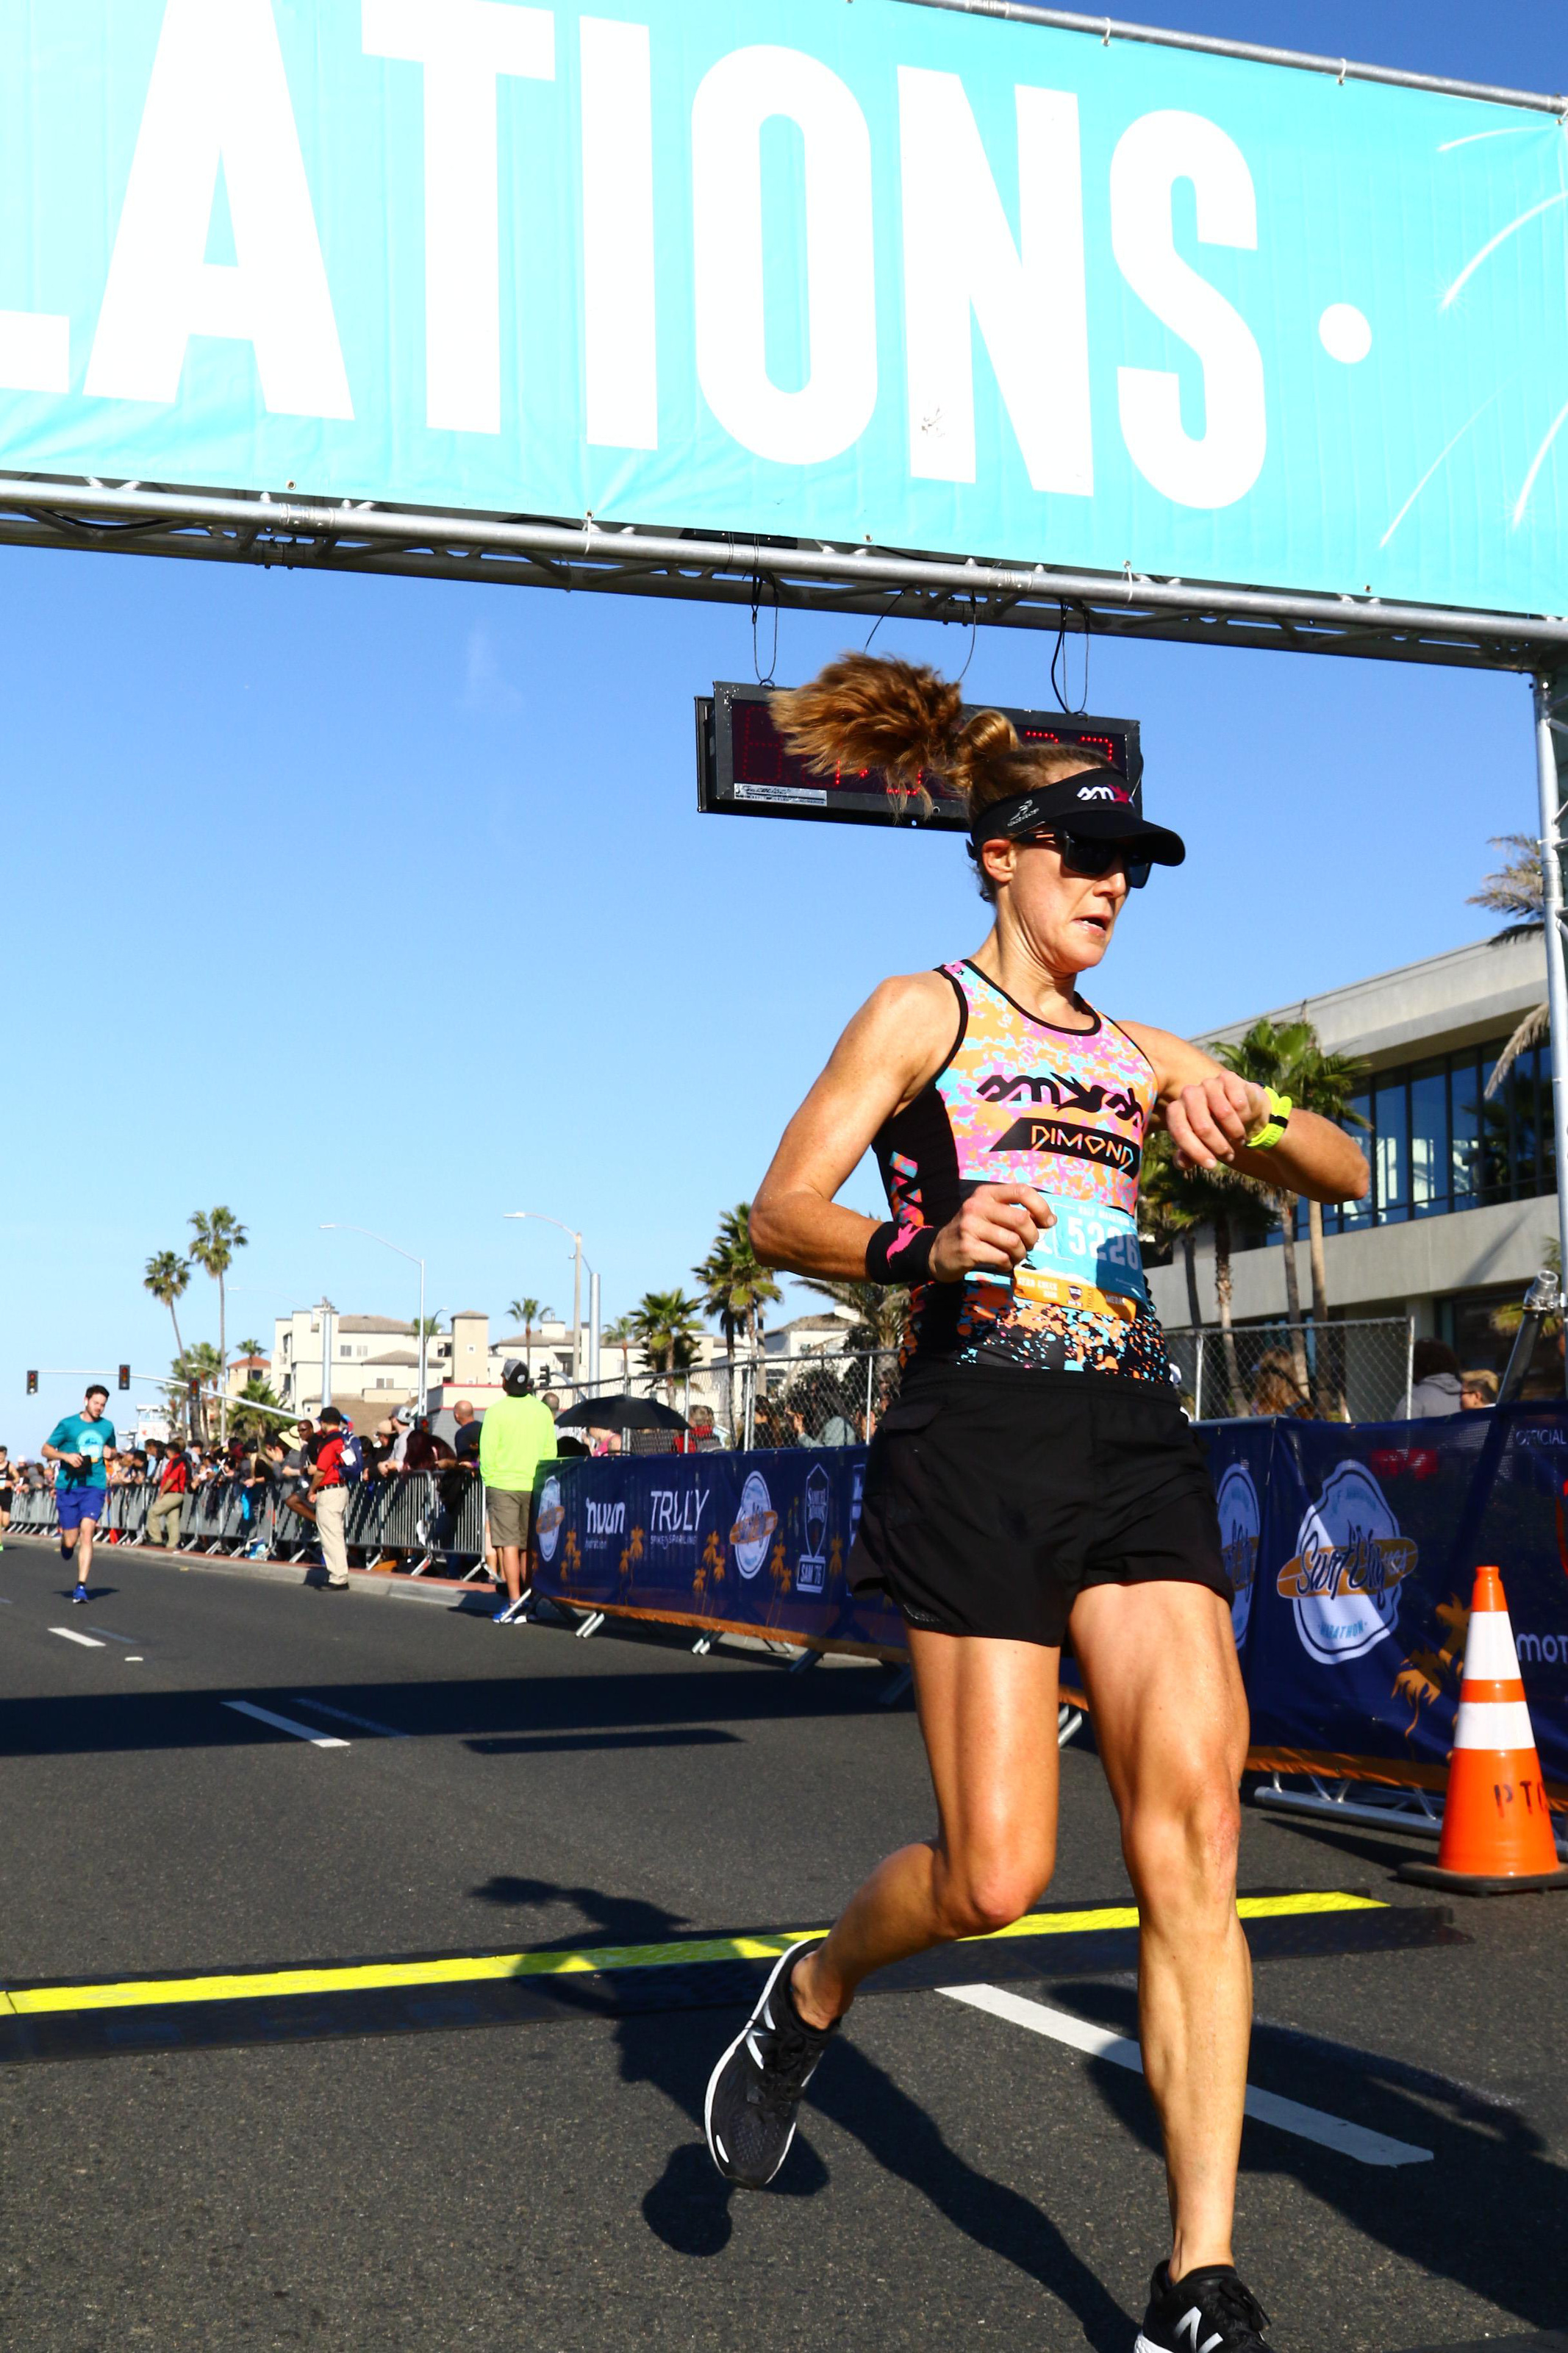 Last year's finish at the Surf City Half Marathon in Huntington Beach.